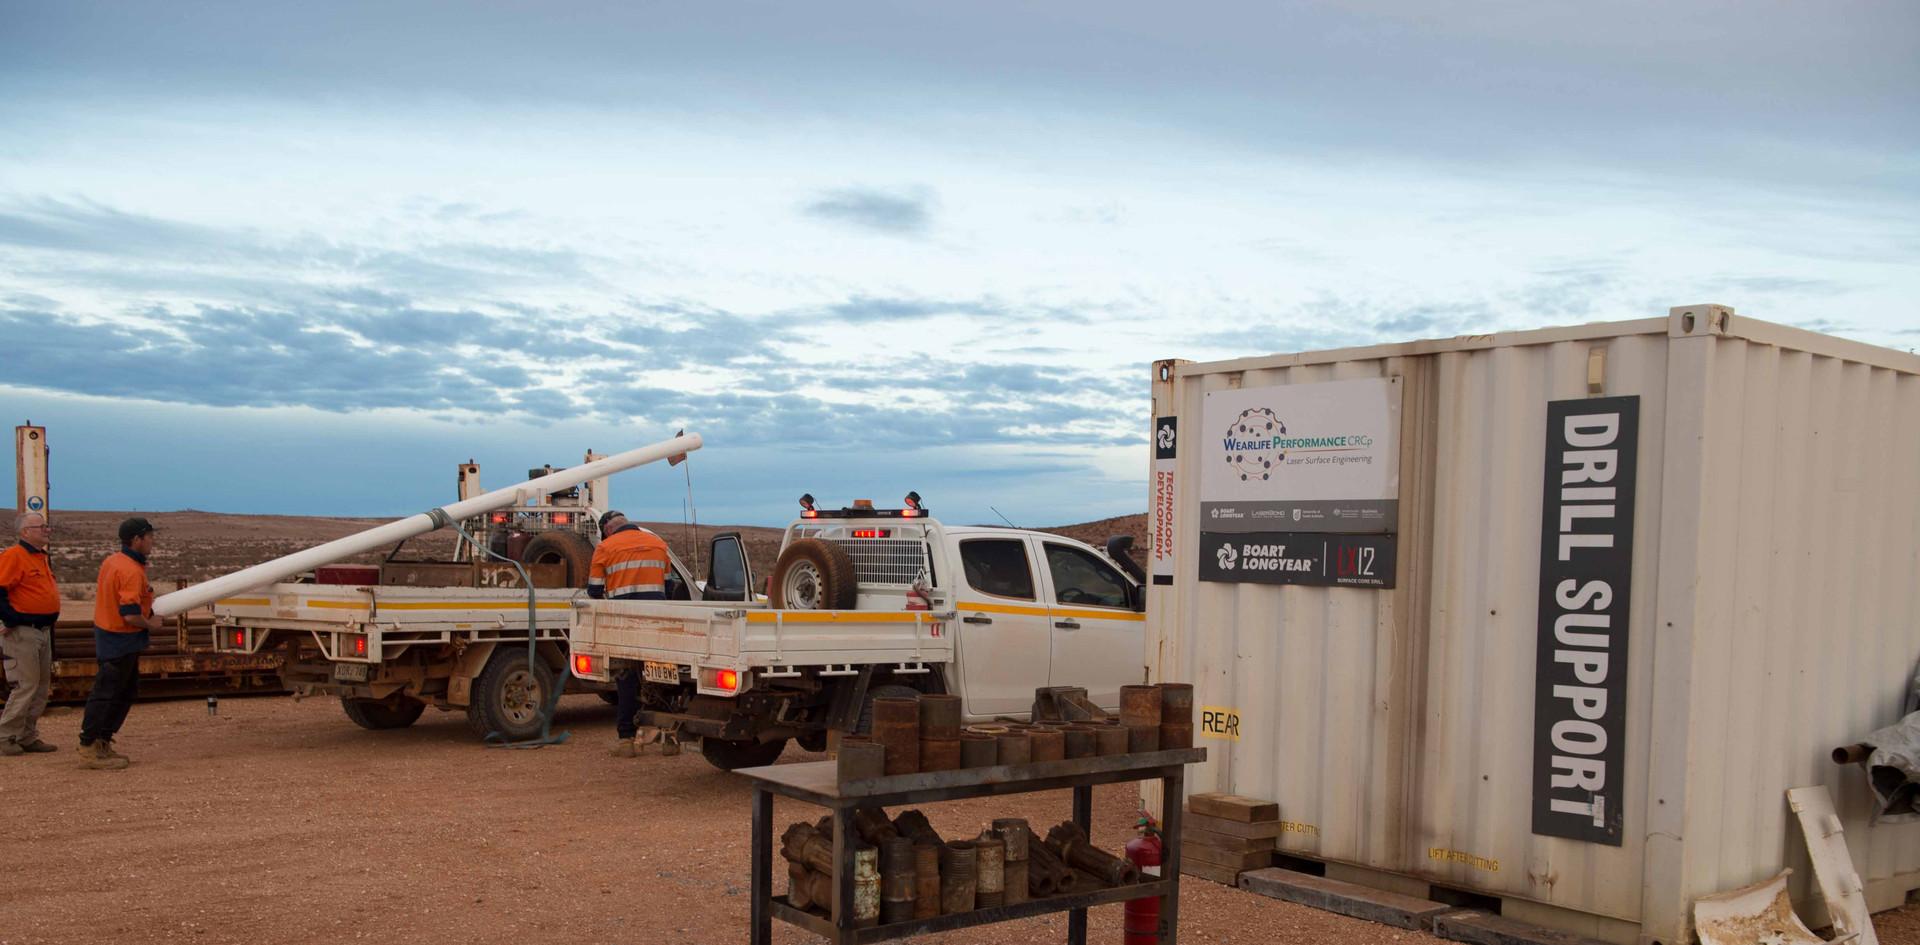 Lodestone Drilling Activities